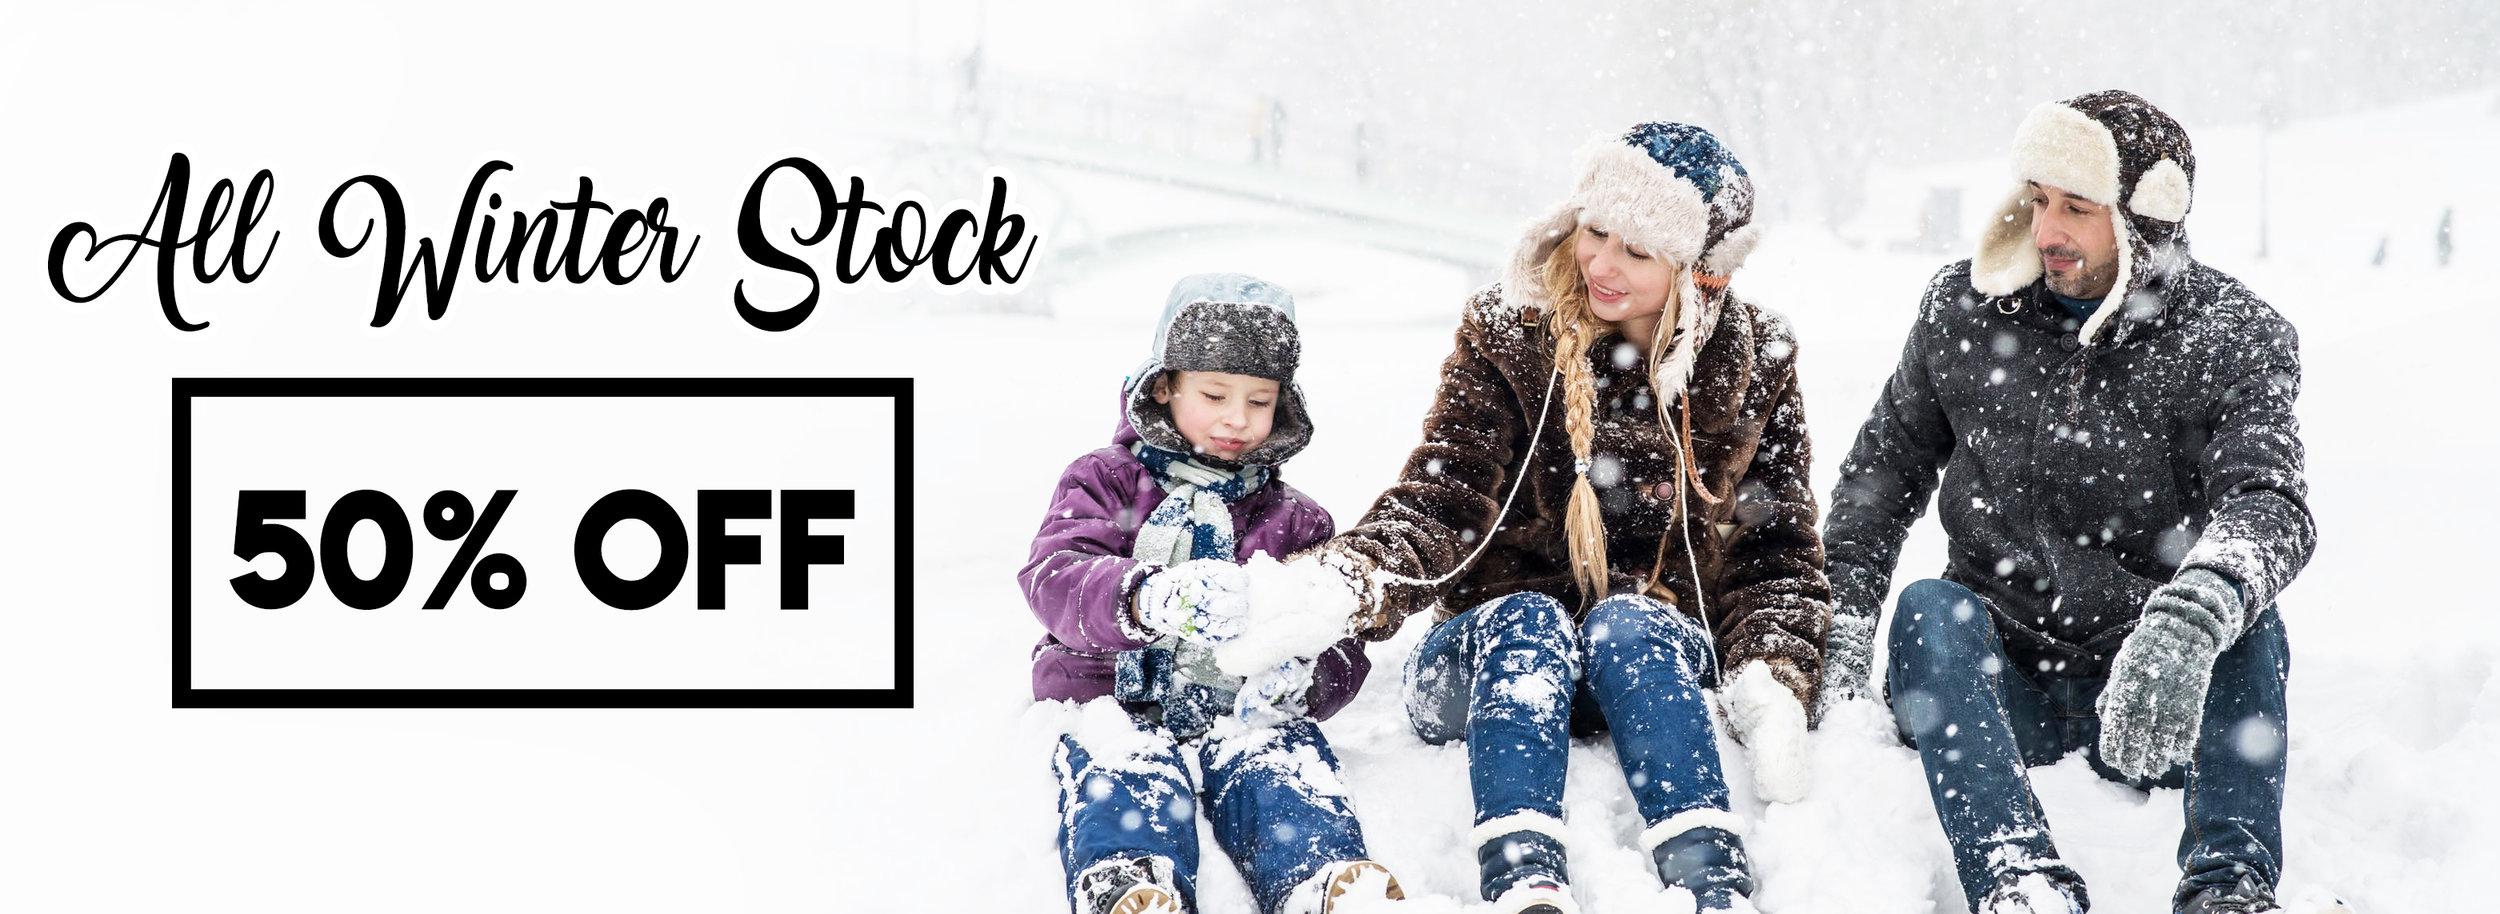 winter website banner 2019.jpg